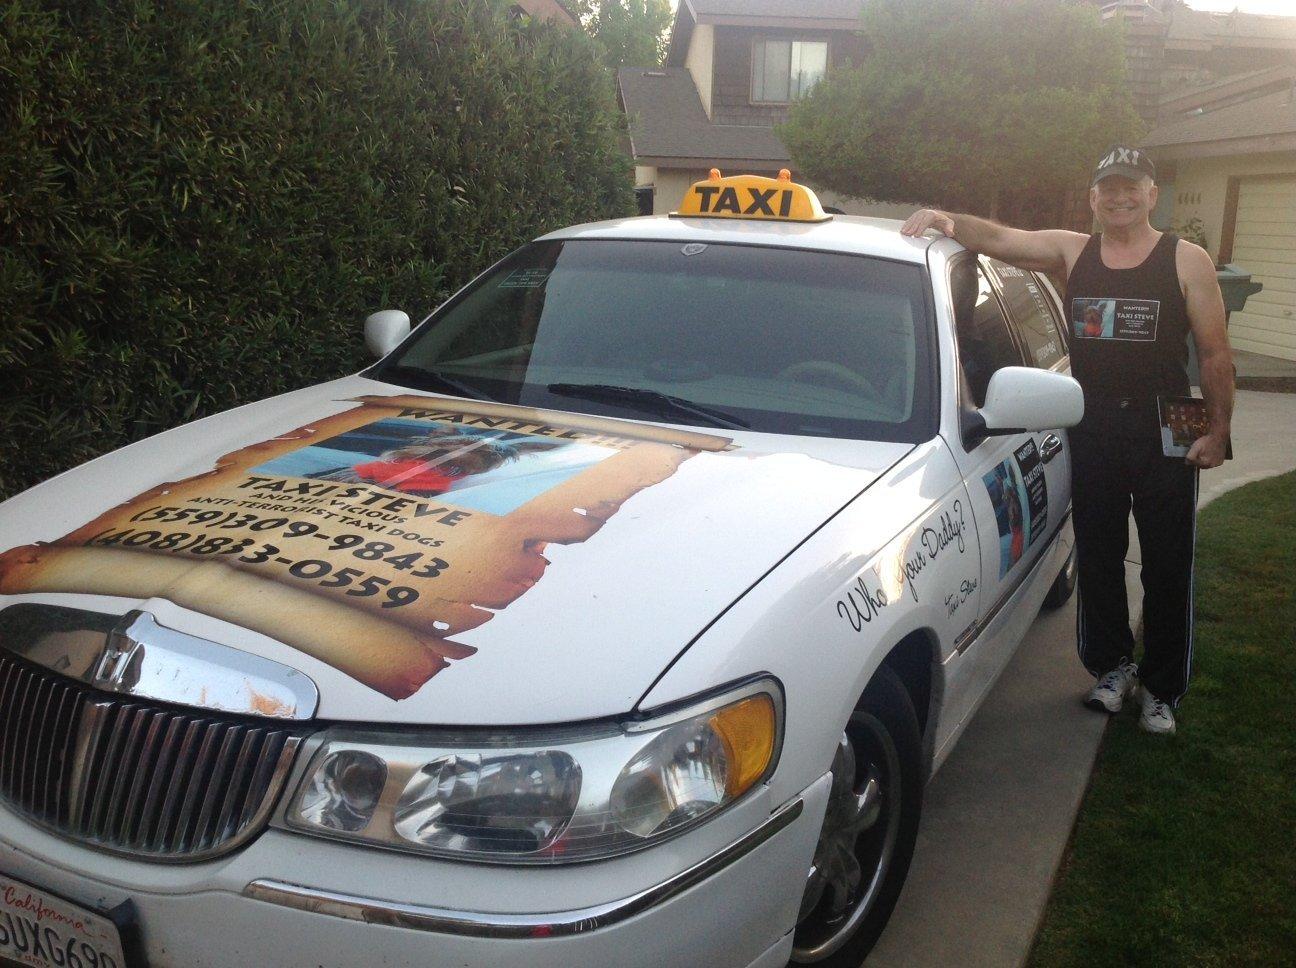 Taxicab and Customer